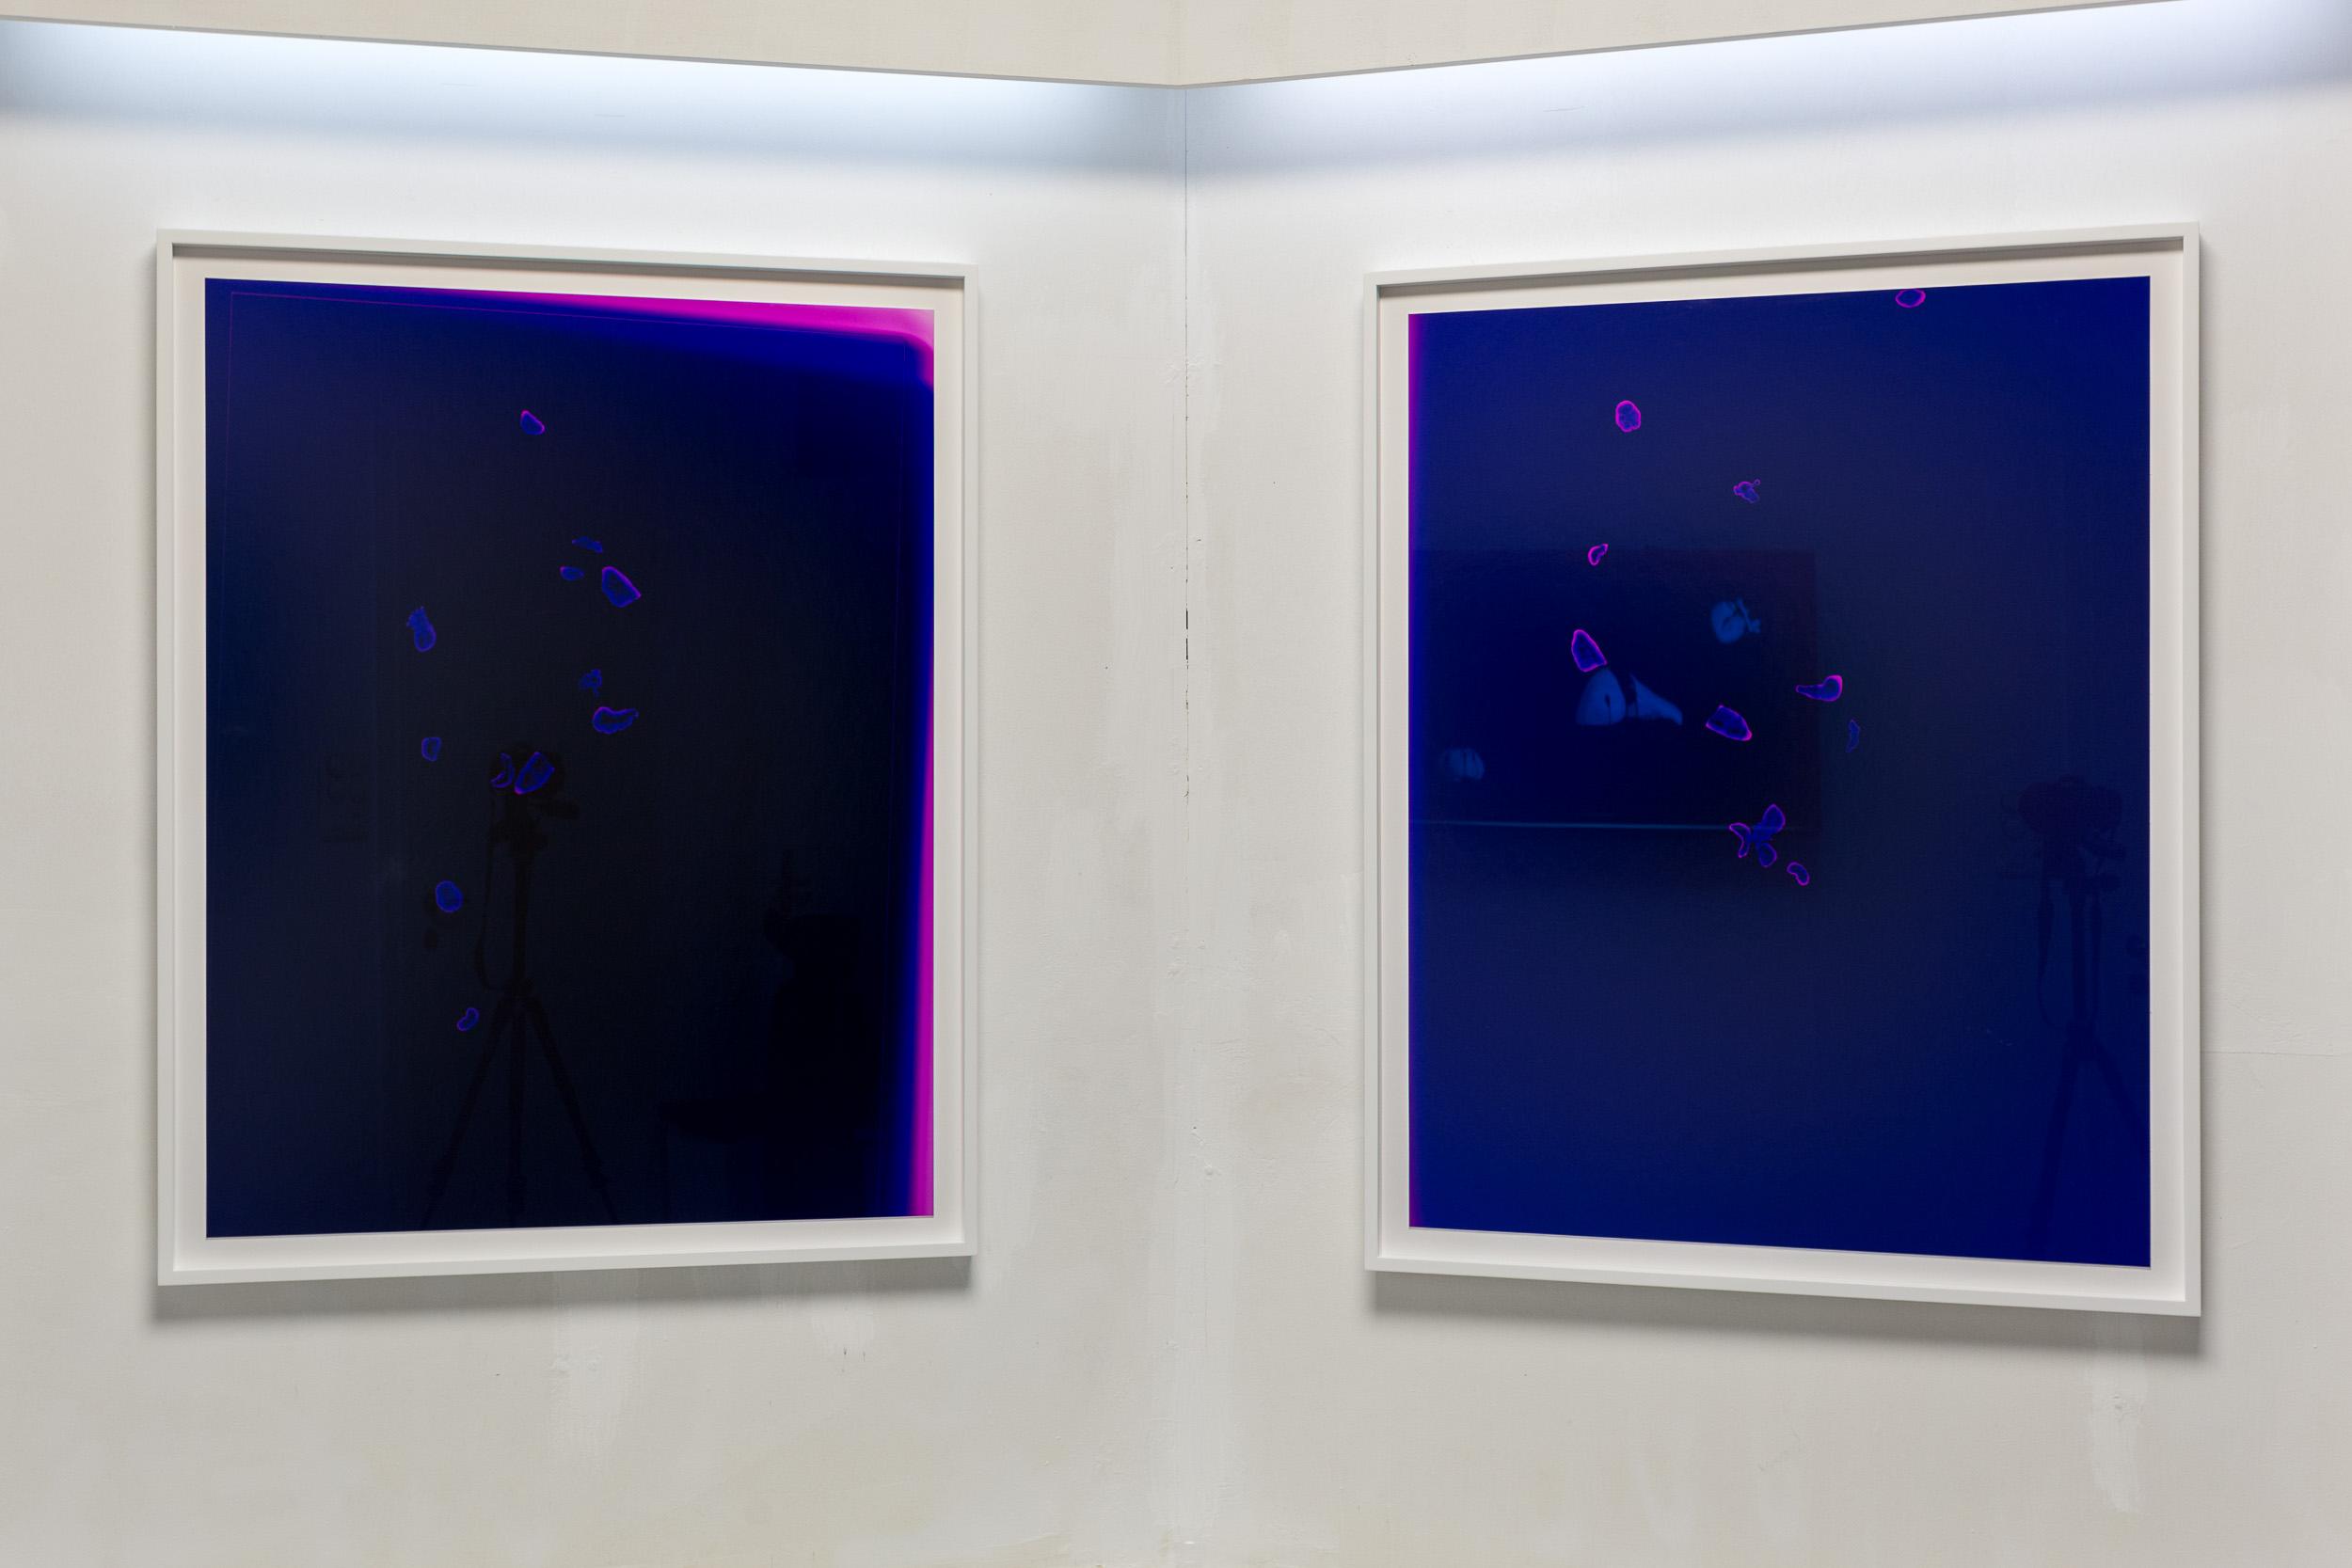 Mélodie Mousset,  Constellations , 2016, Photogram, 85 x 109cm each  Photo: Kilian Bannwart